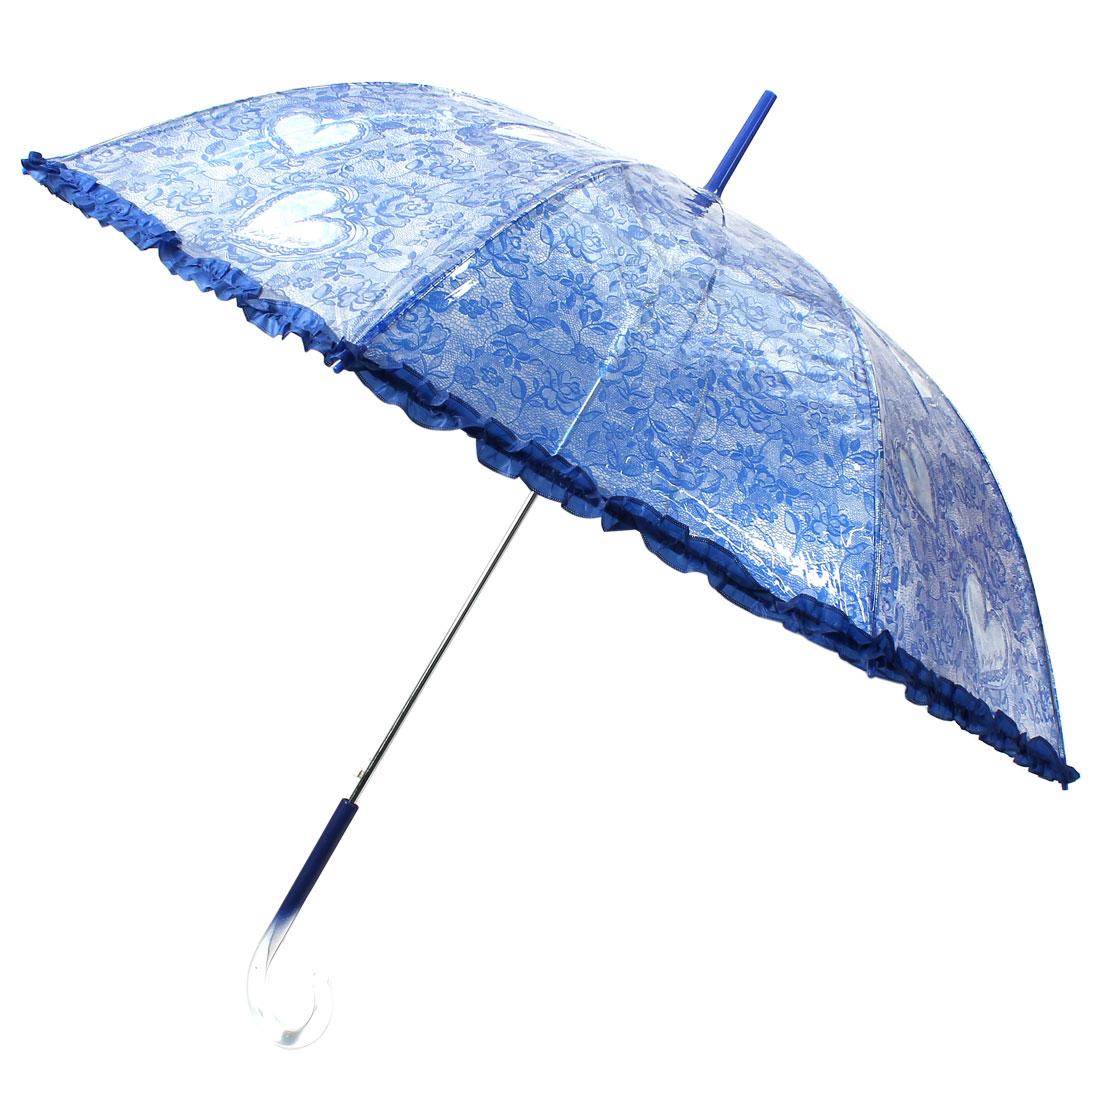 Long Hooked Handle Floral Heart Print Lace Rim Umbrella Transparent Blue